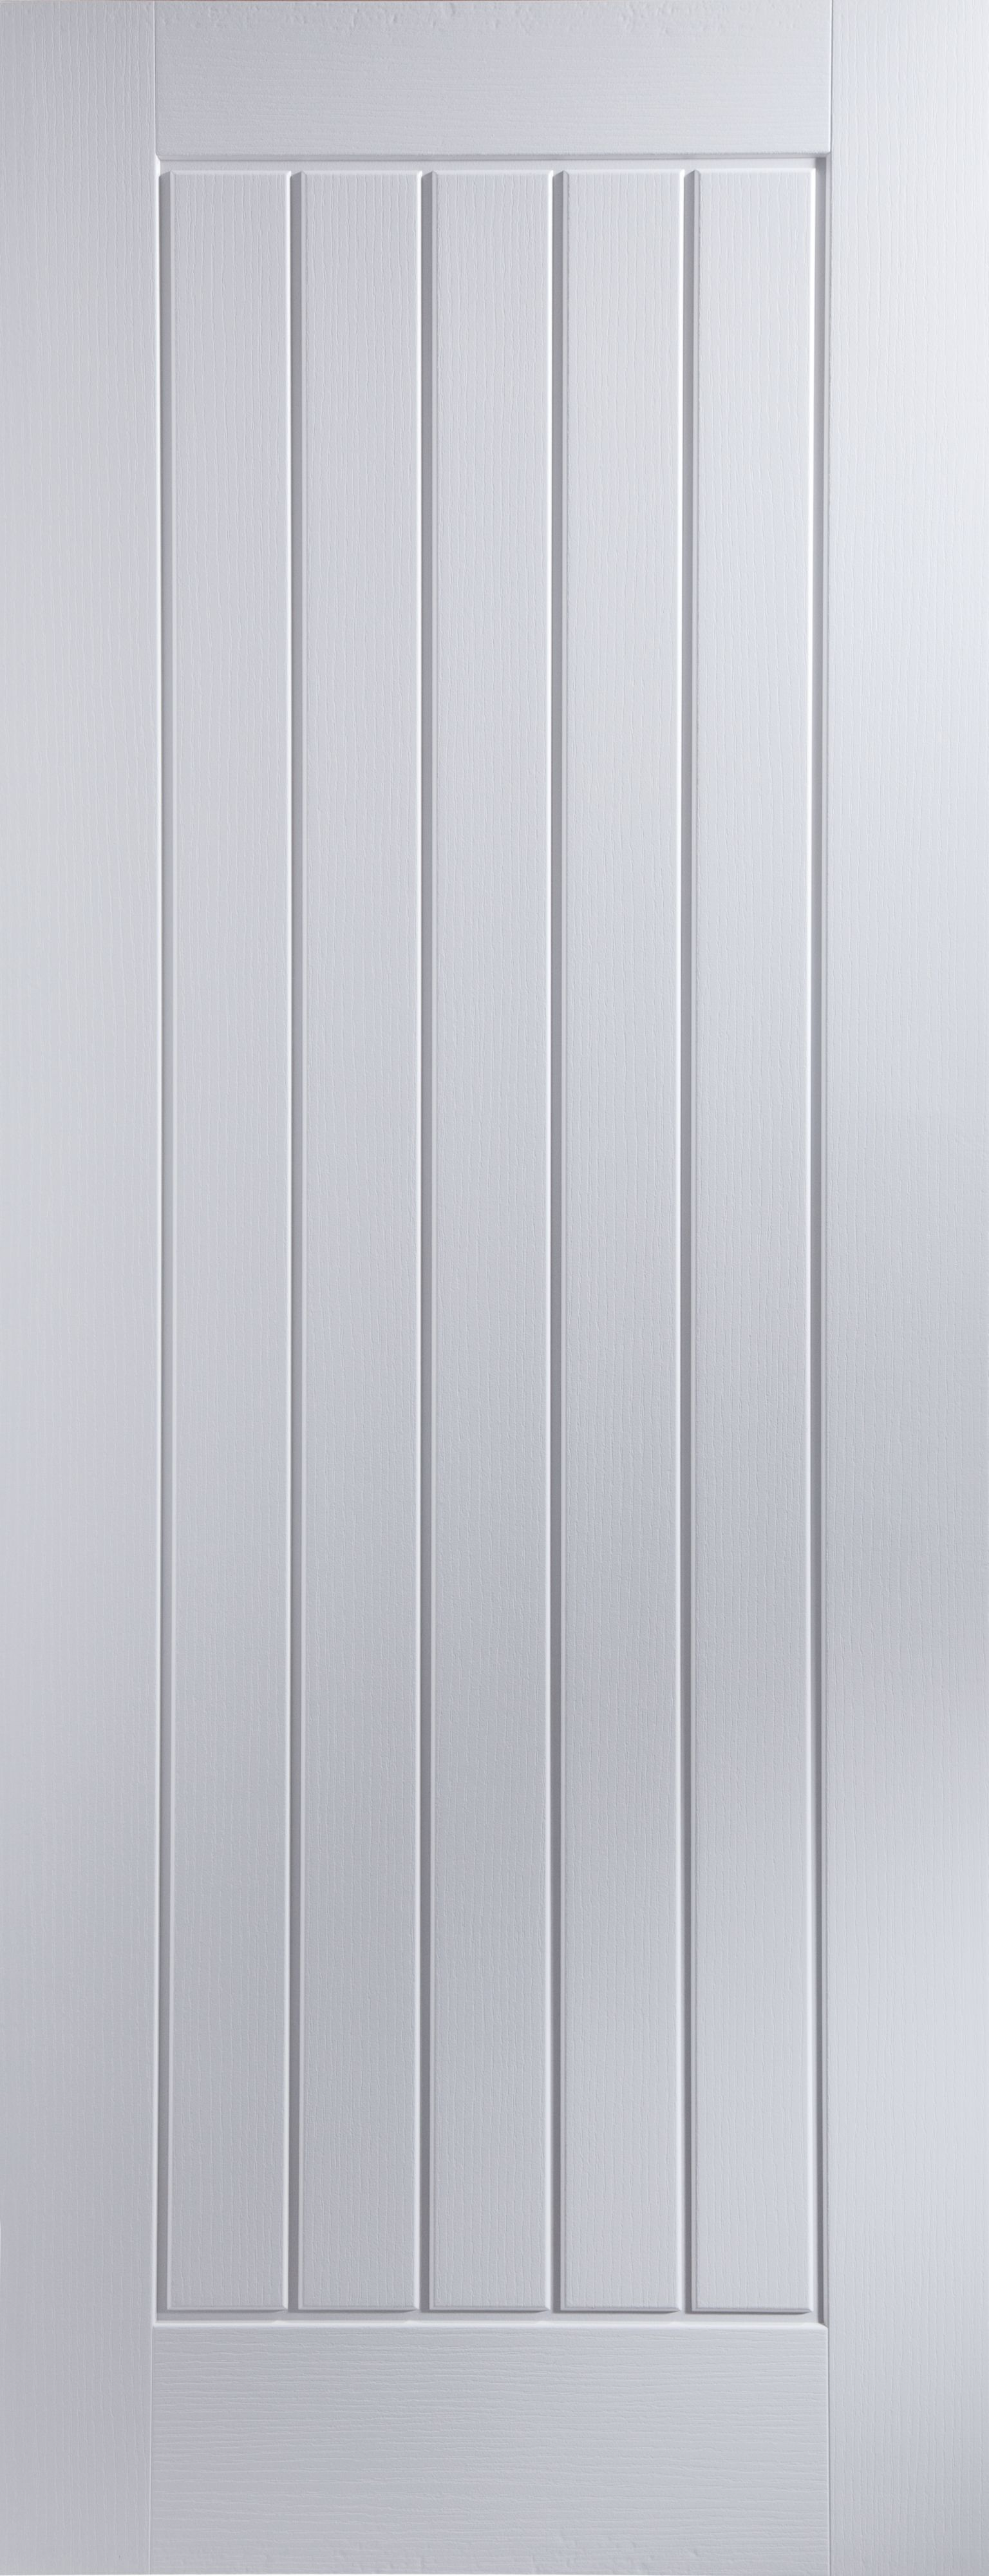 cottage panel pre painted white woodgrain unglazed. Black Bedroom Furniture Sets. Home Design Ideas